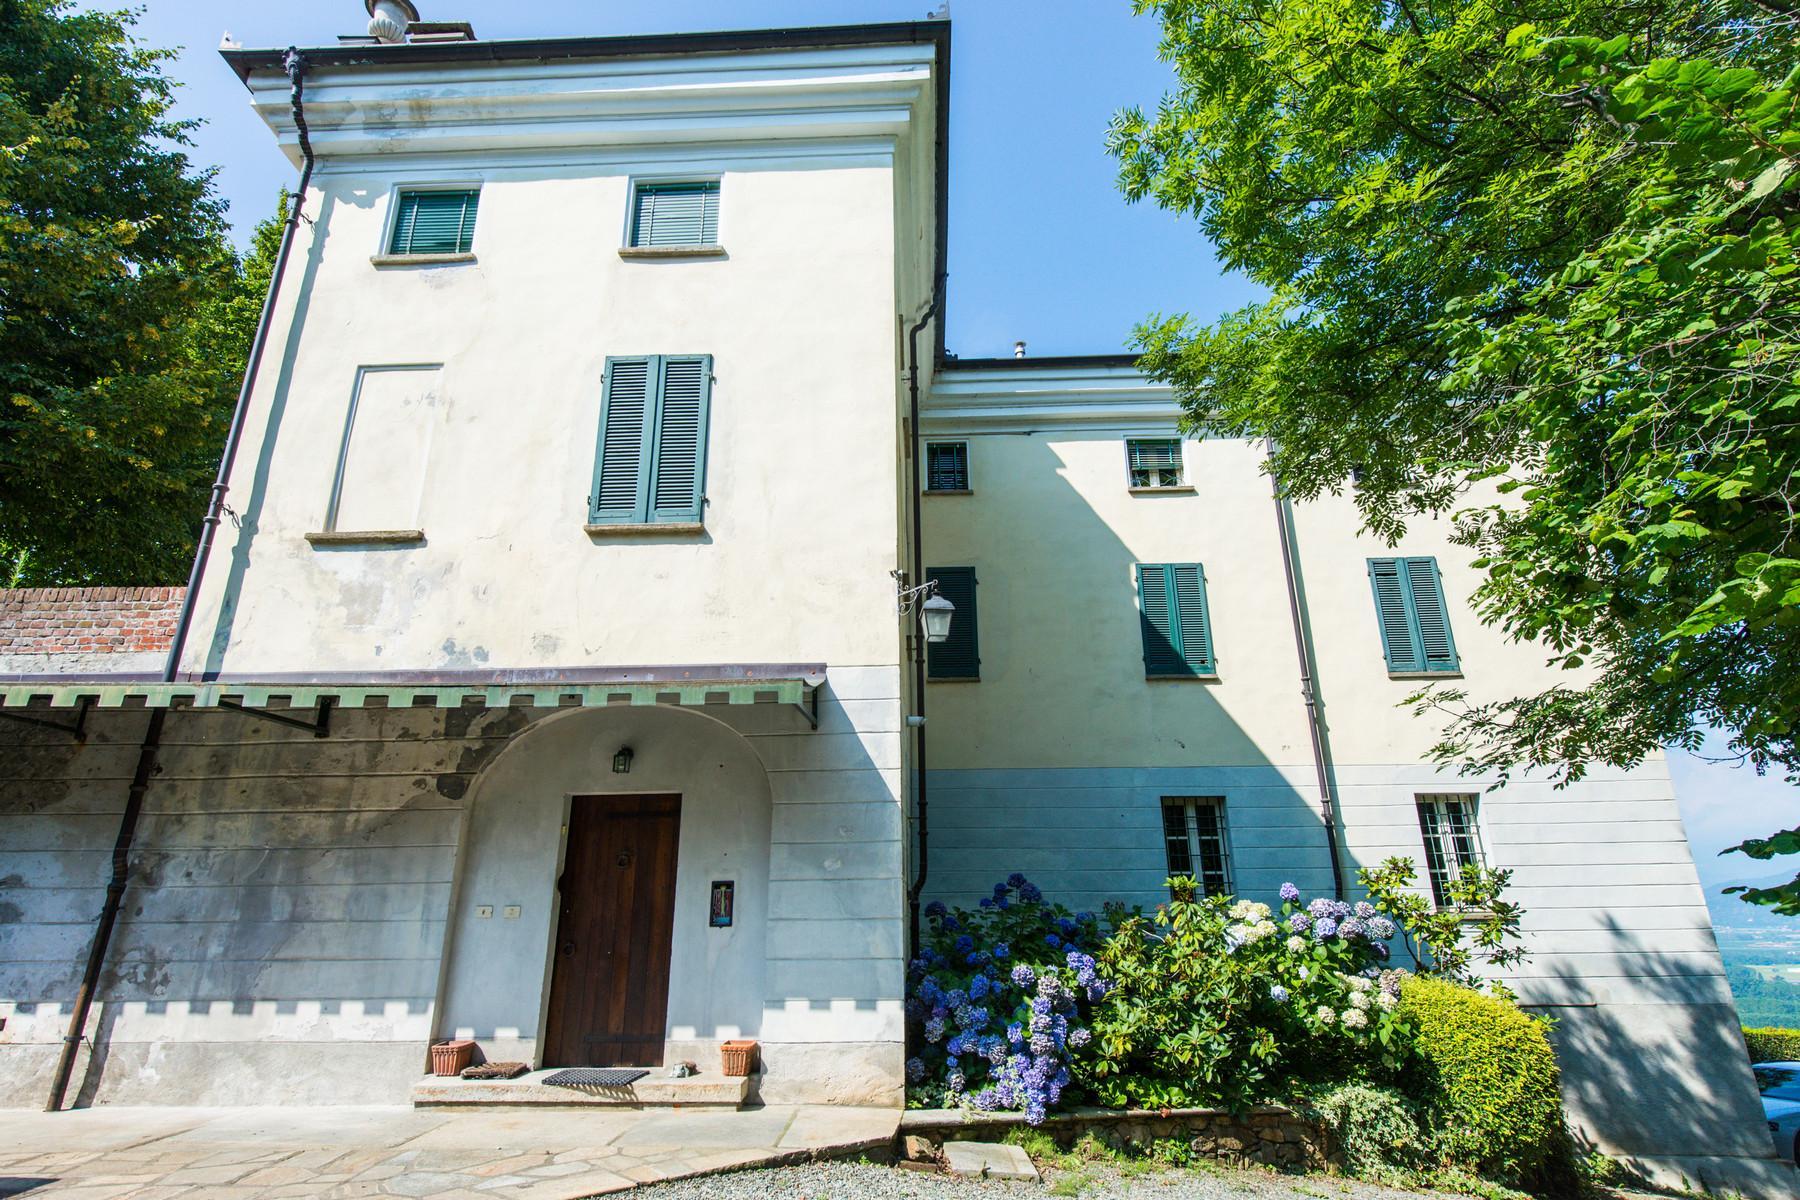 Splendid villa with winery in Piedmont - 28